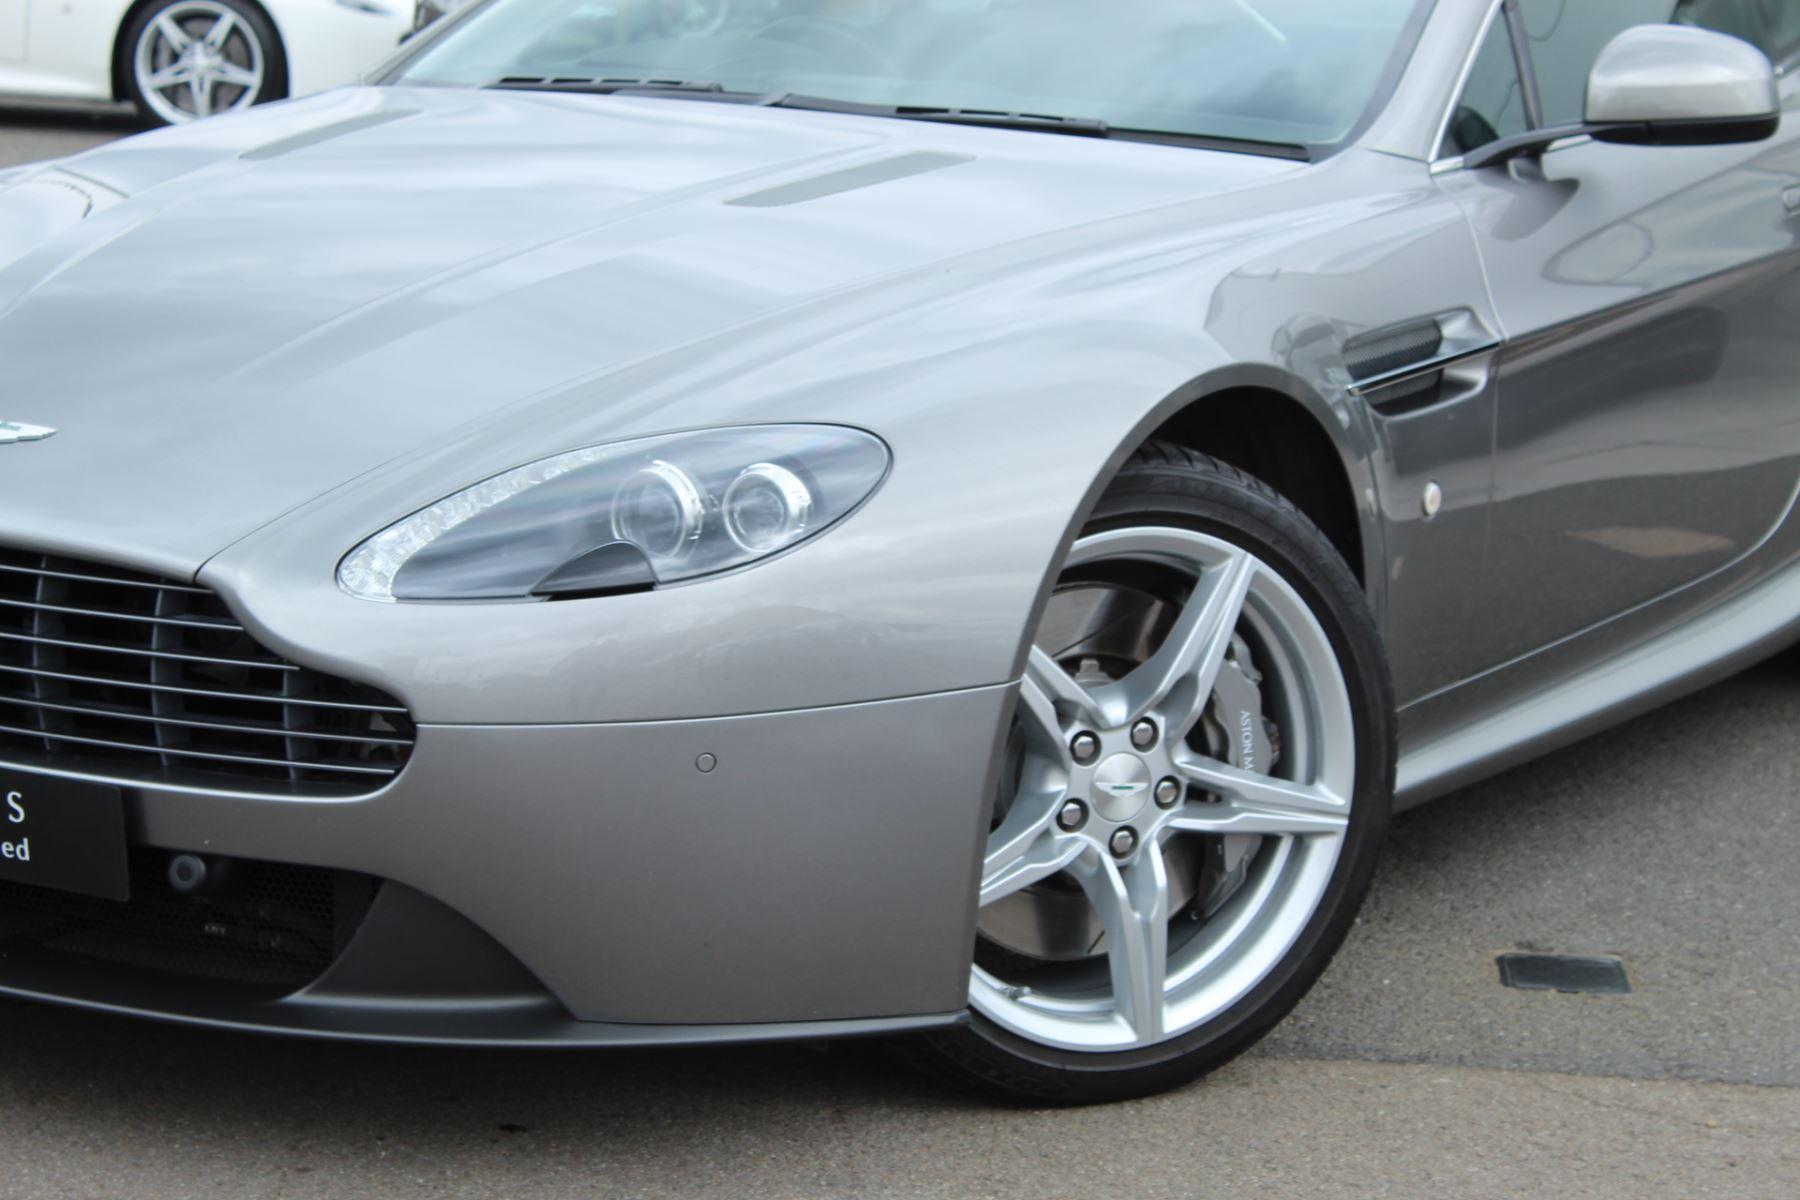 Aston Martin V8 Vantage Coupe 2dr Sportshift [420] image 8